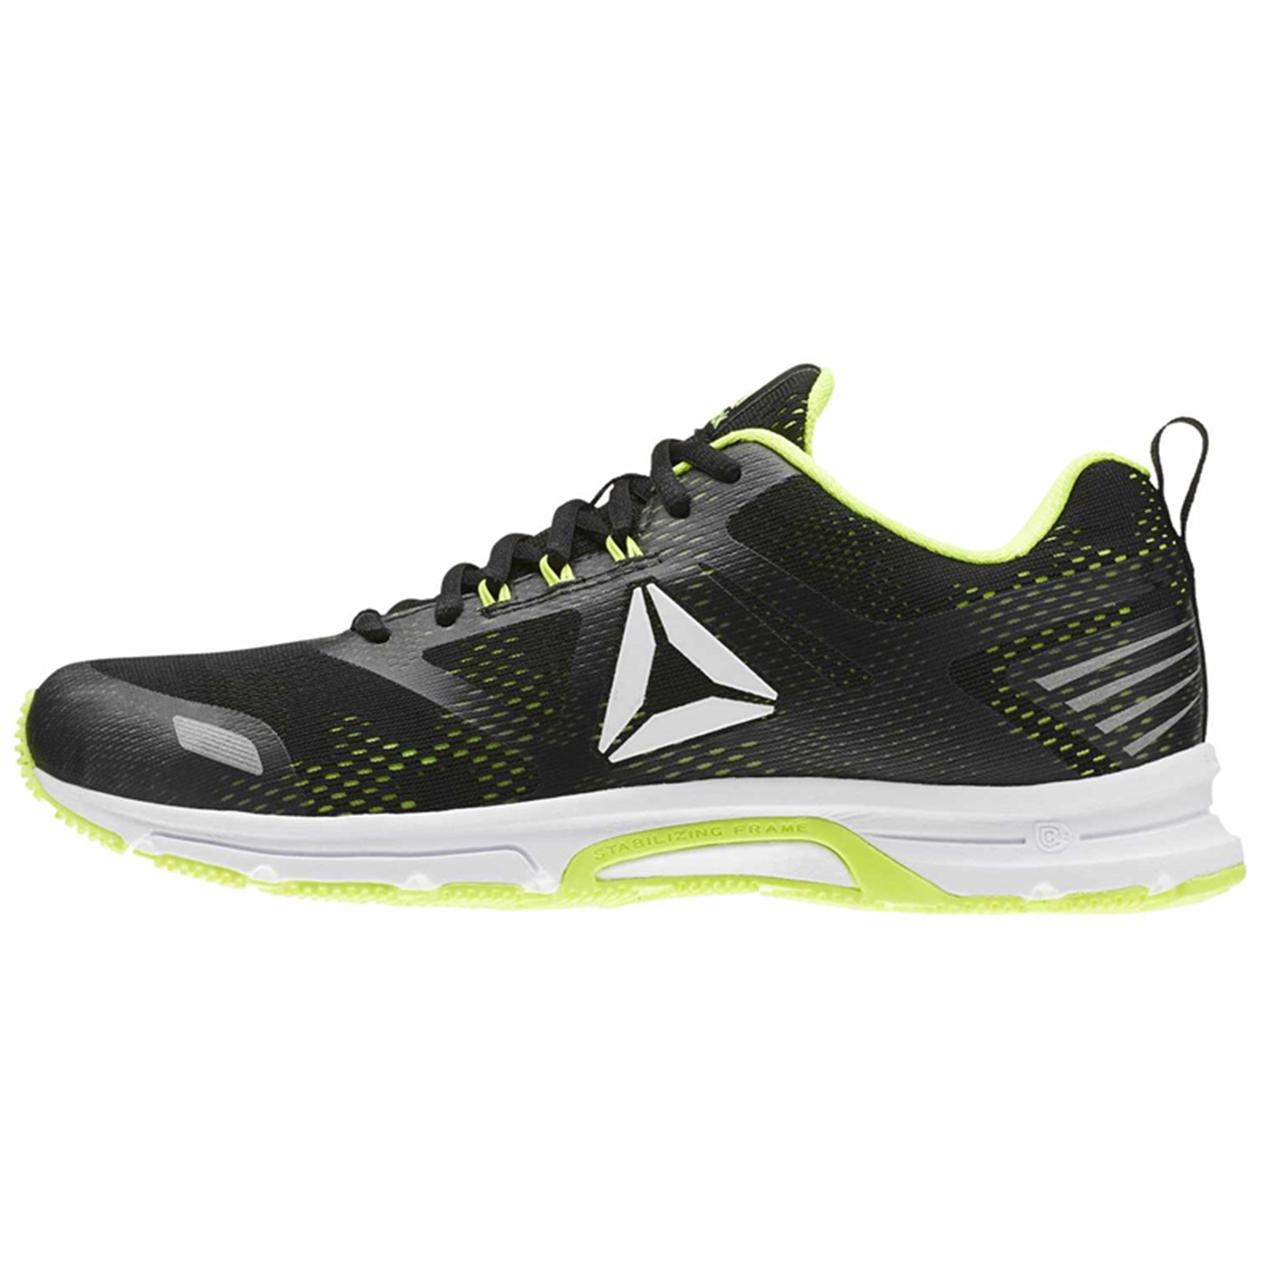 قیمت کفش مخصوص دویدن مردانه ریباک مدل AHARY RUNNER SHOES - CN5343